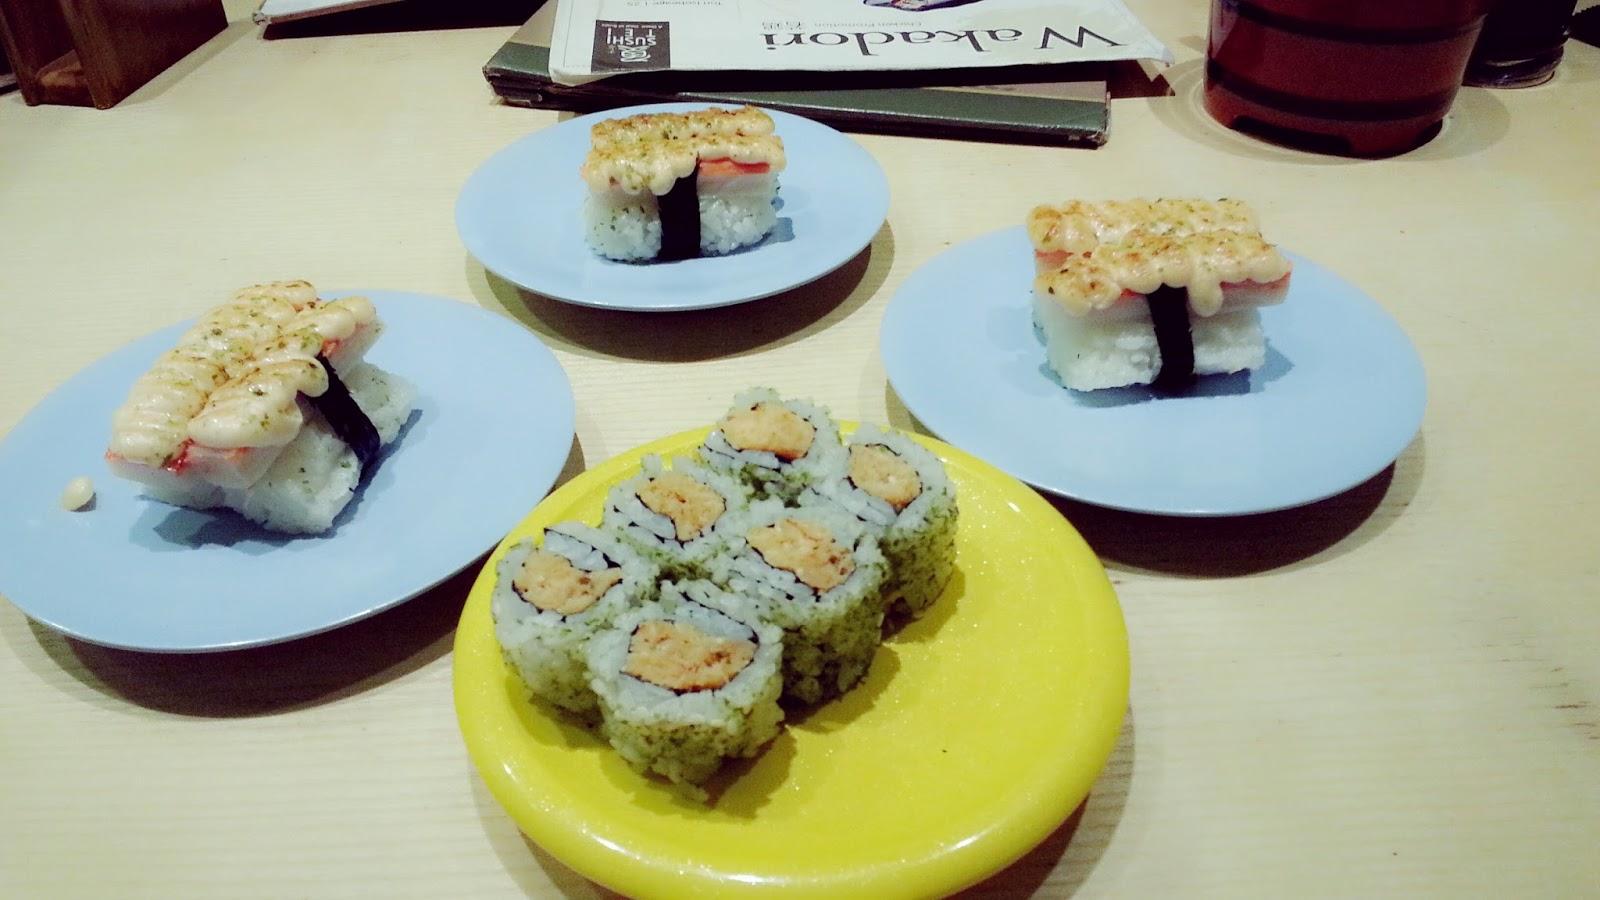 Michaellenat Blog Sushi Tei Japanese Food